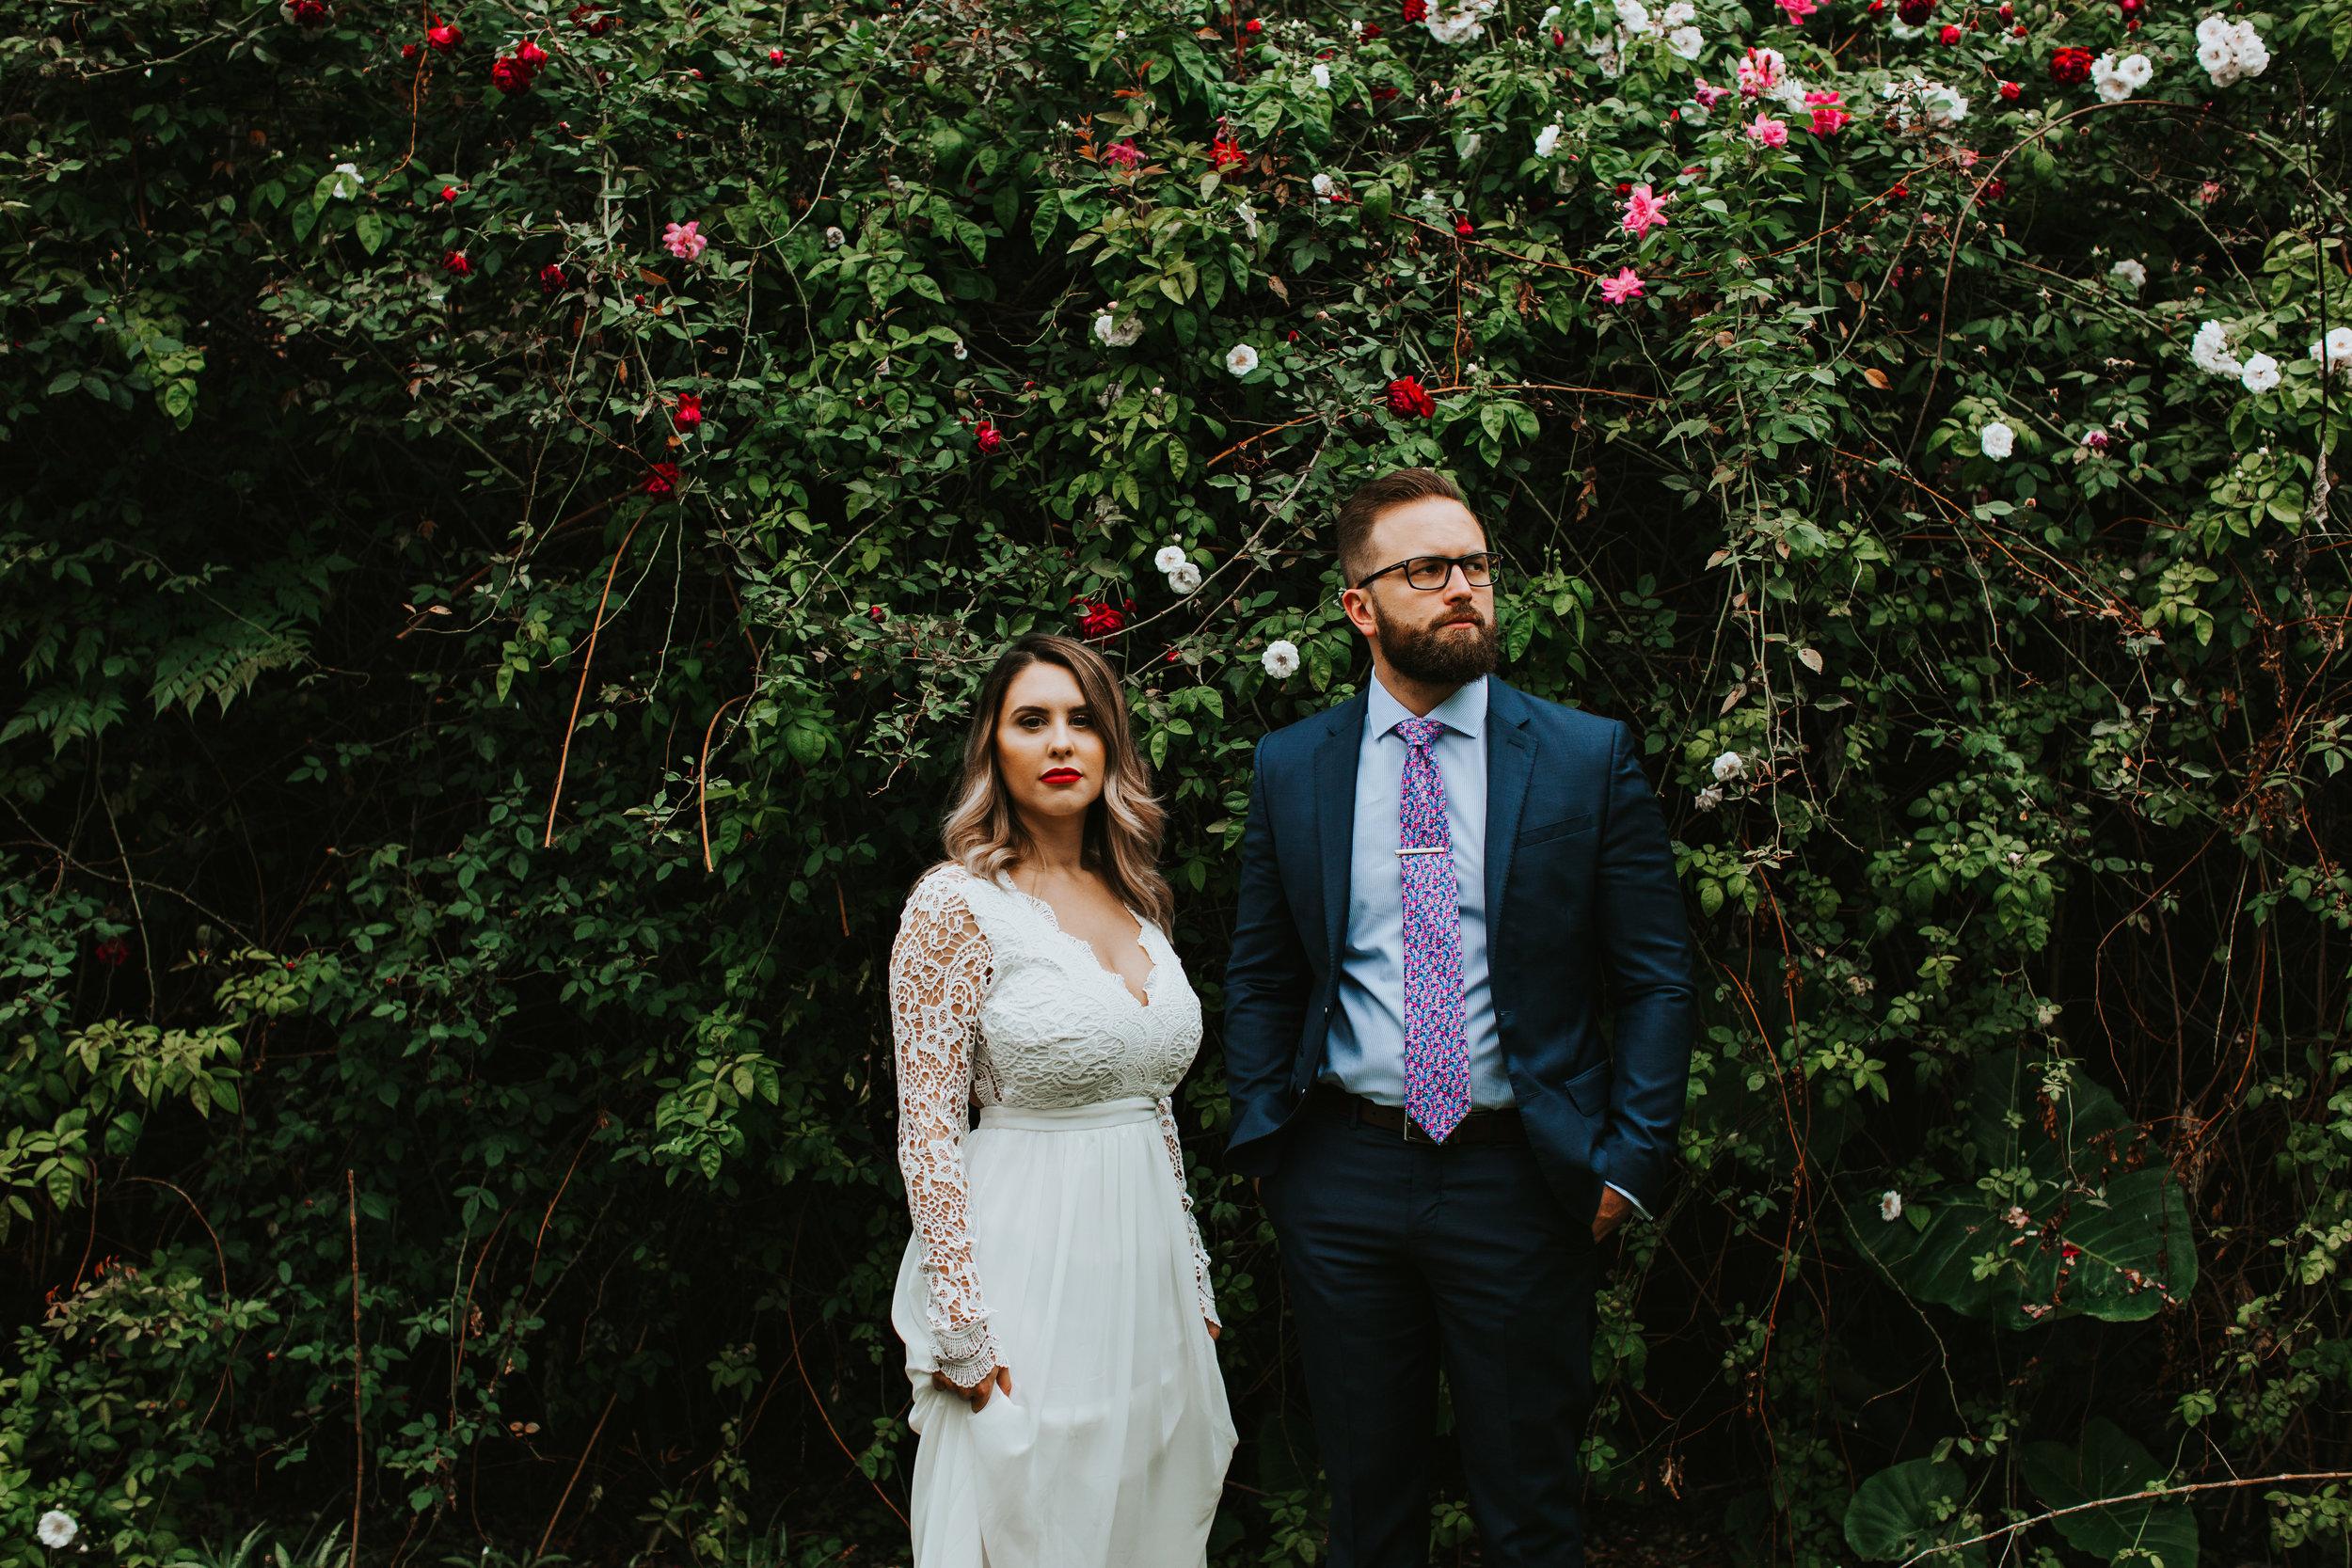 New Orleans Wedding Photographer French Quarter Engagement Session-56.jpg